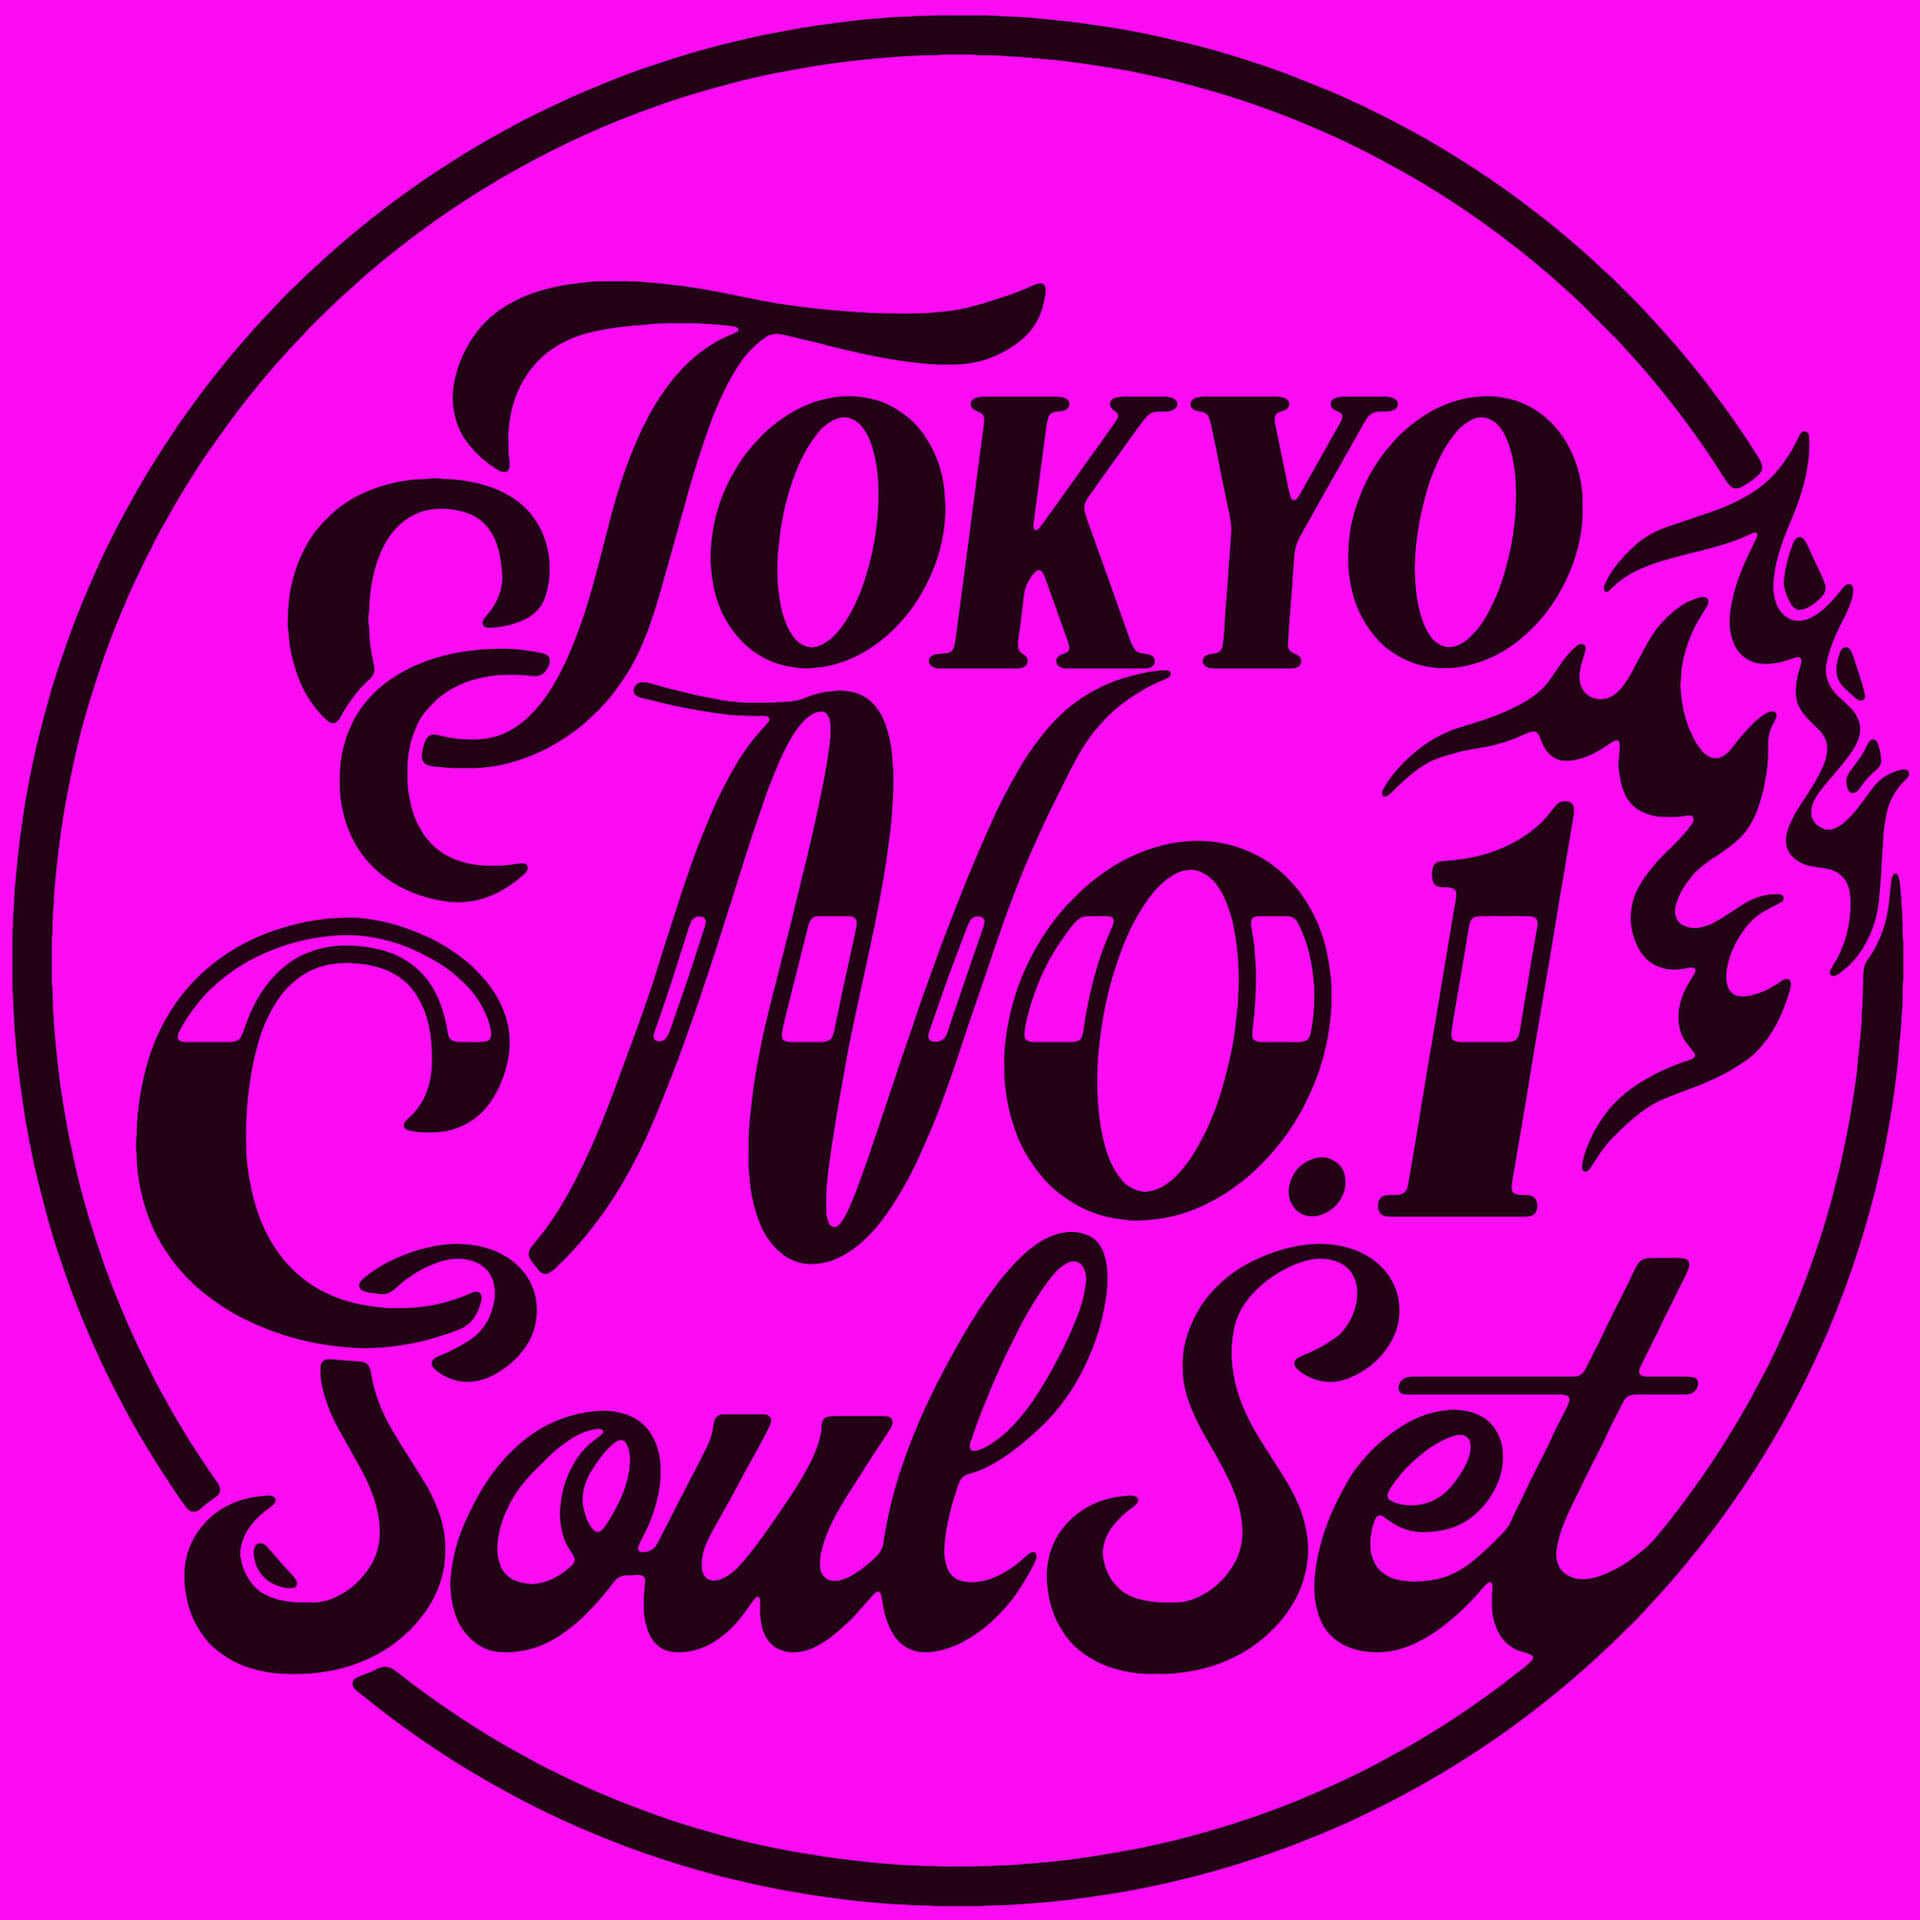 "TOKYO No.1 SOUL SET結成30周年記念!代表曲""JIVE MY REVOLVE""の完全セルフリメイク版が本日リリース music201202_tokyono1soulset_2-1920x1920"